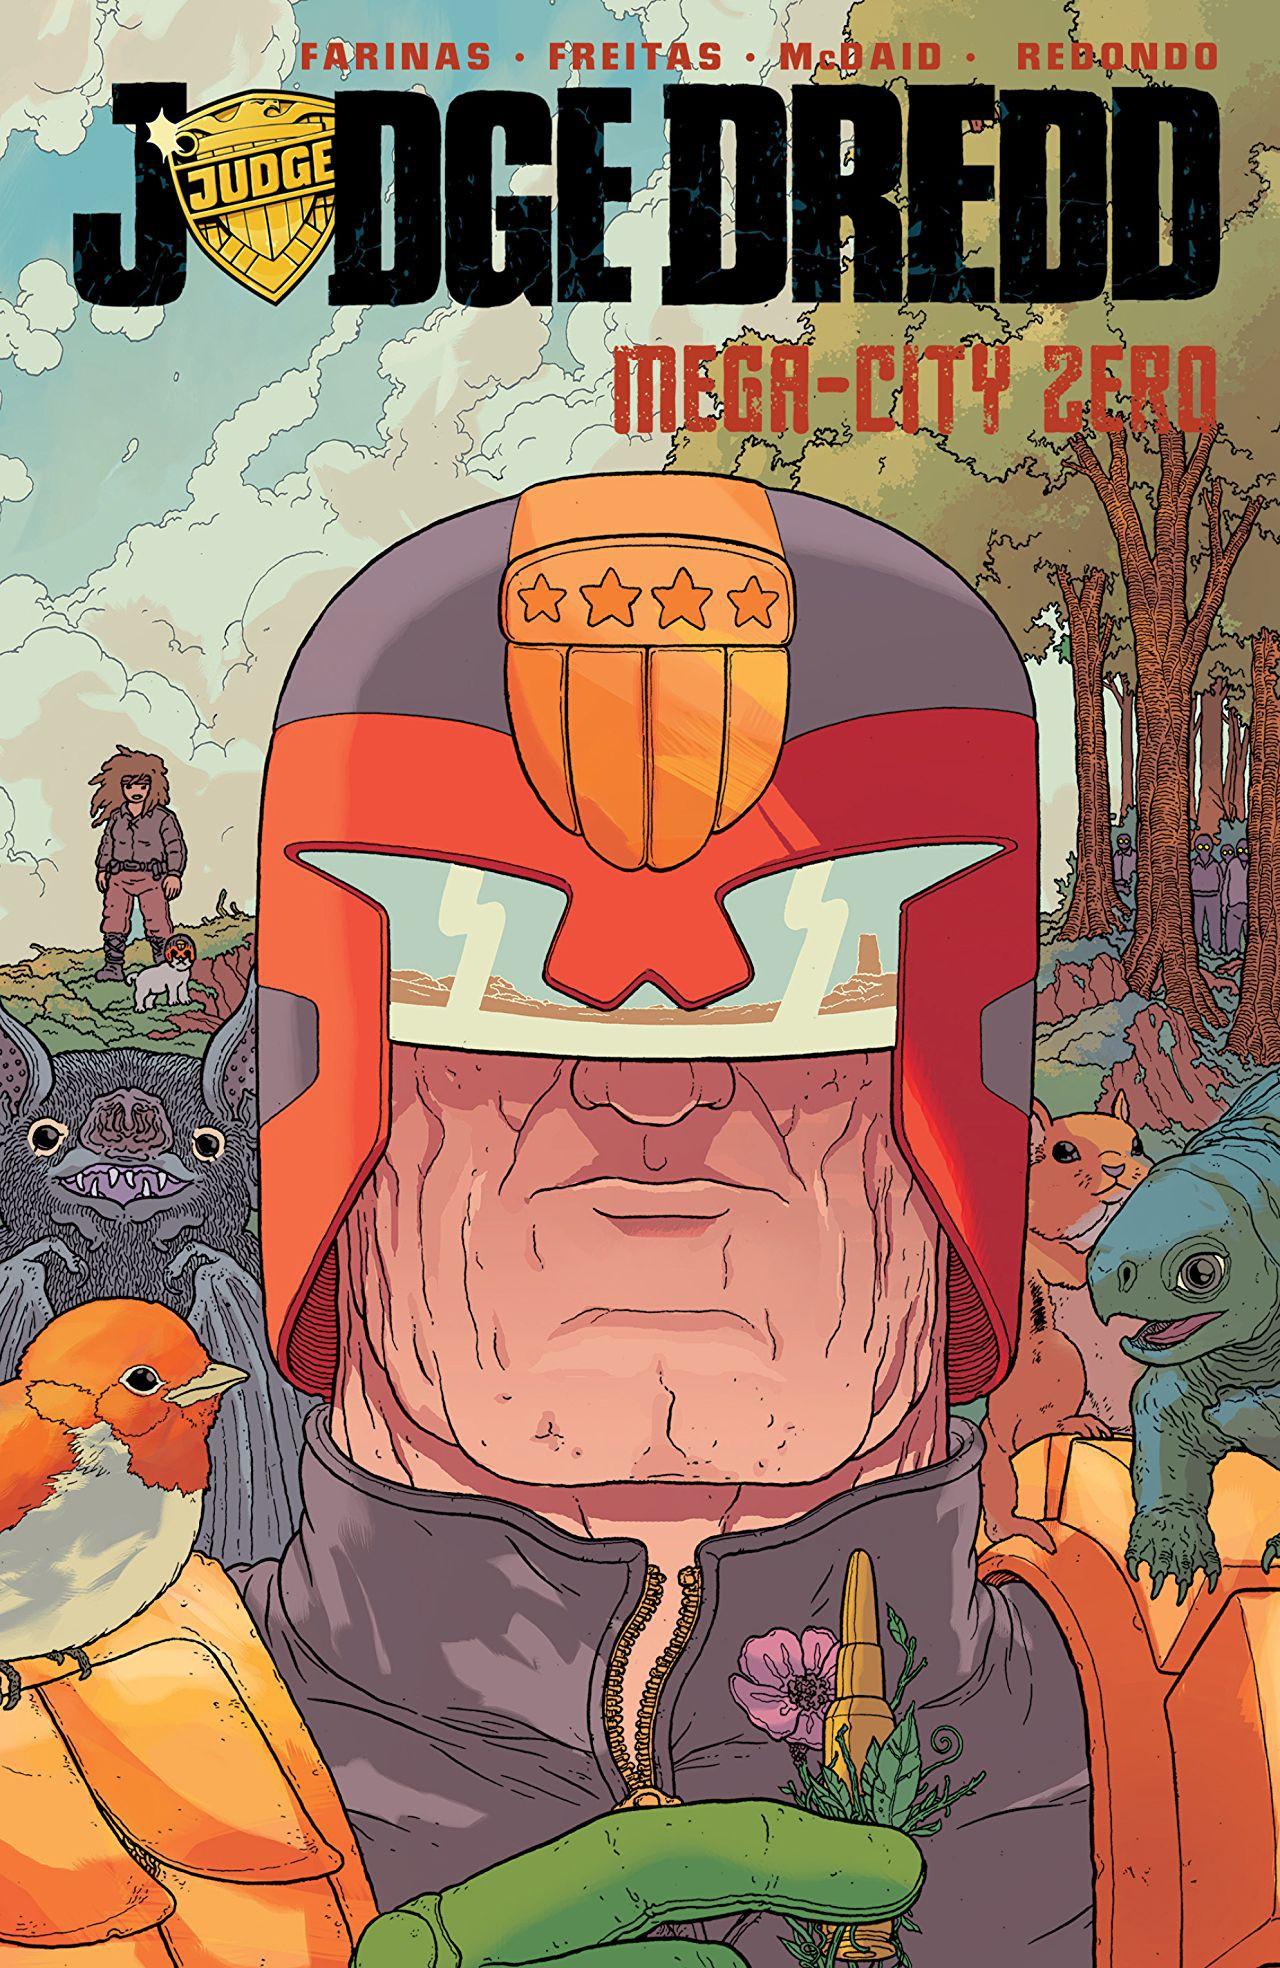 Judge Dredd - Mega-City Zero 2